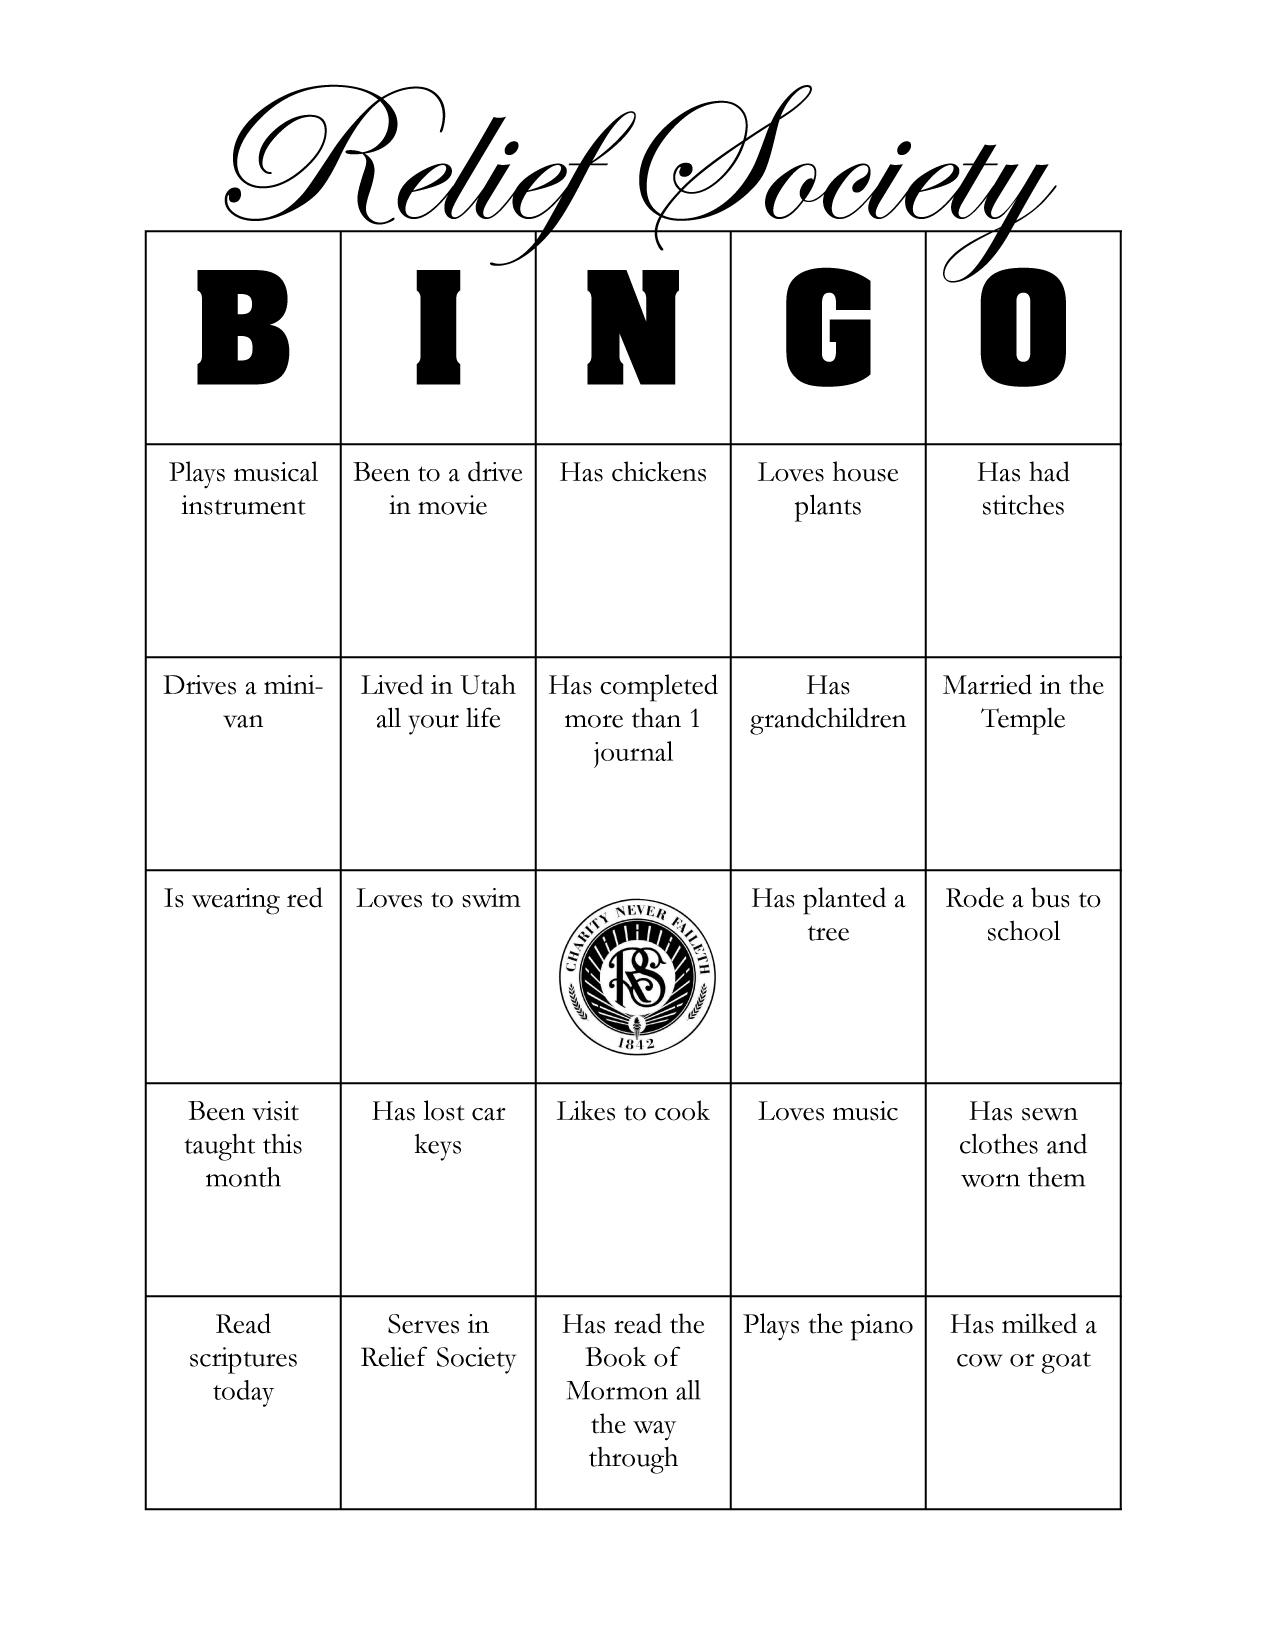 Relief Society Birthday Bingo